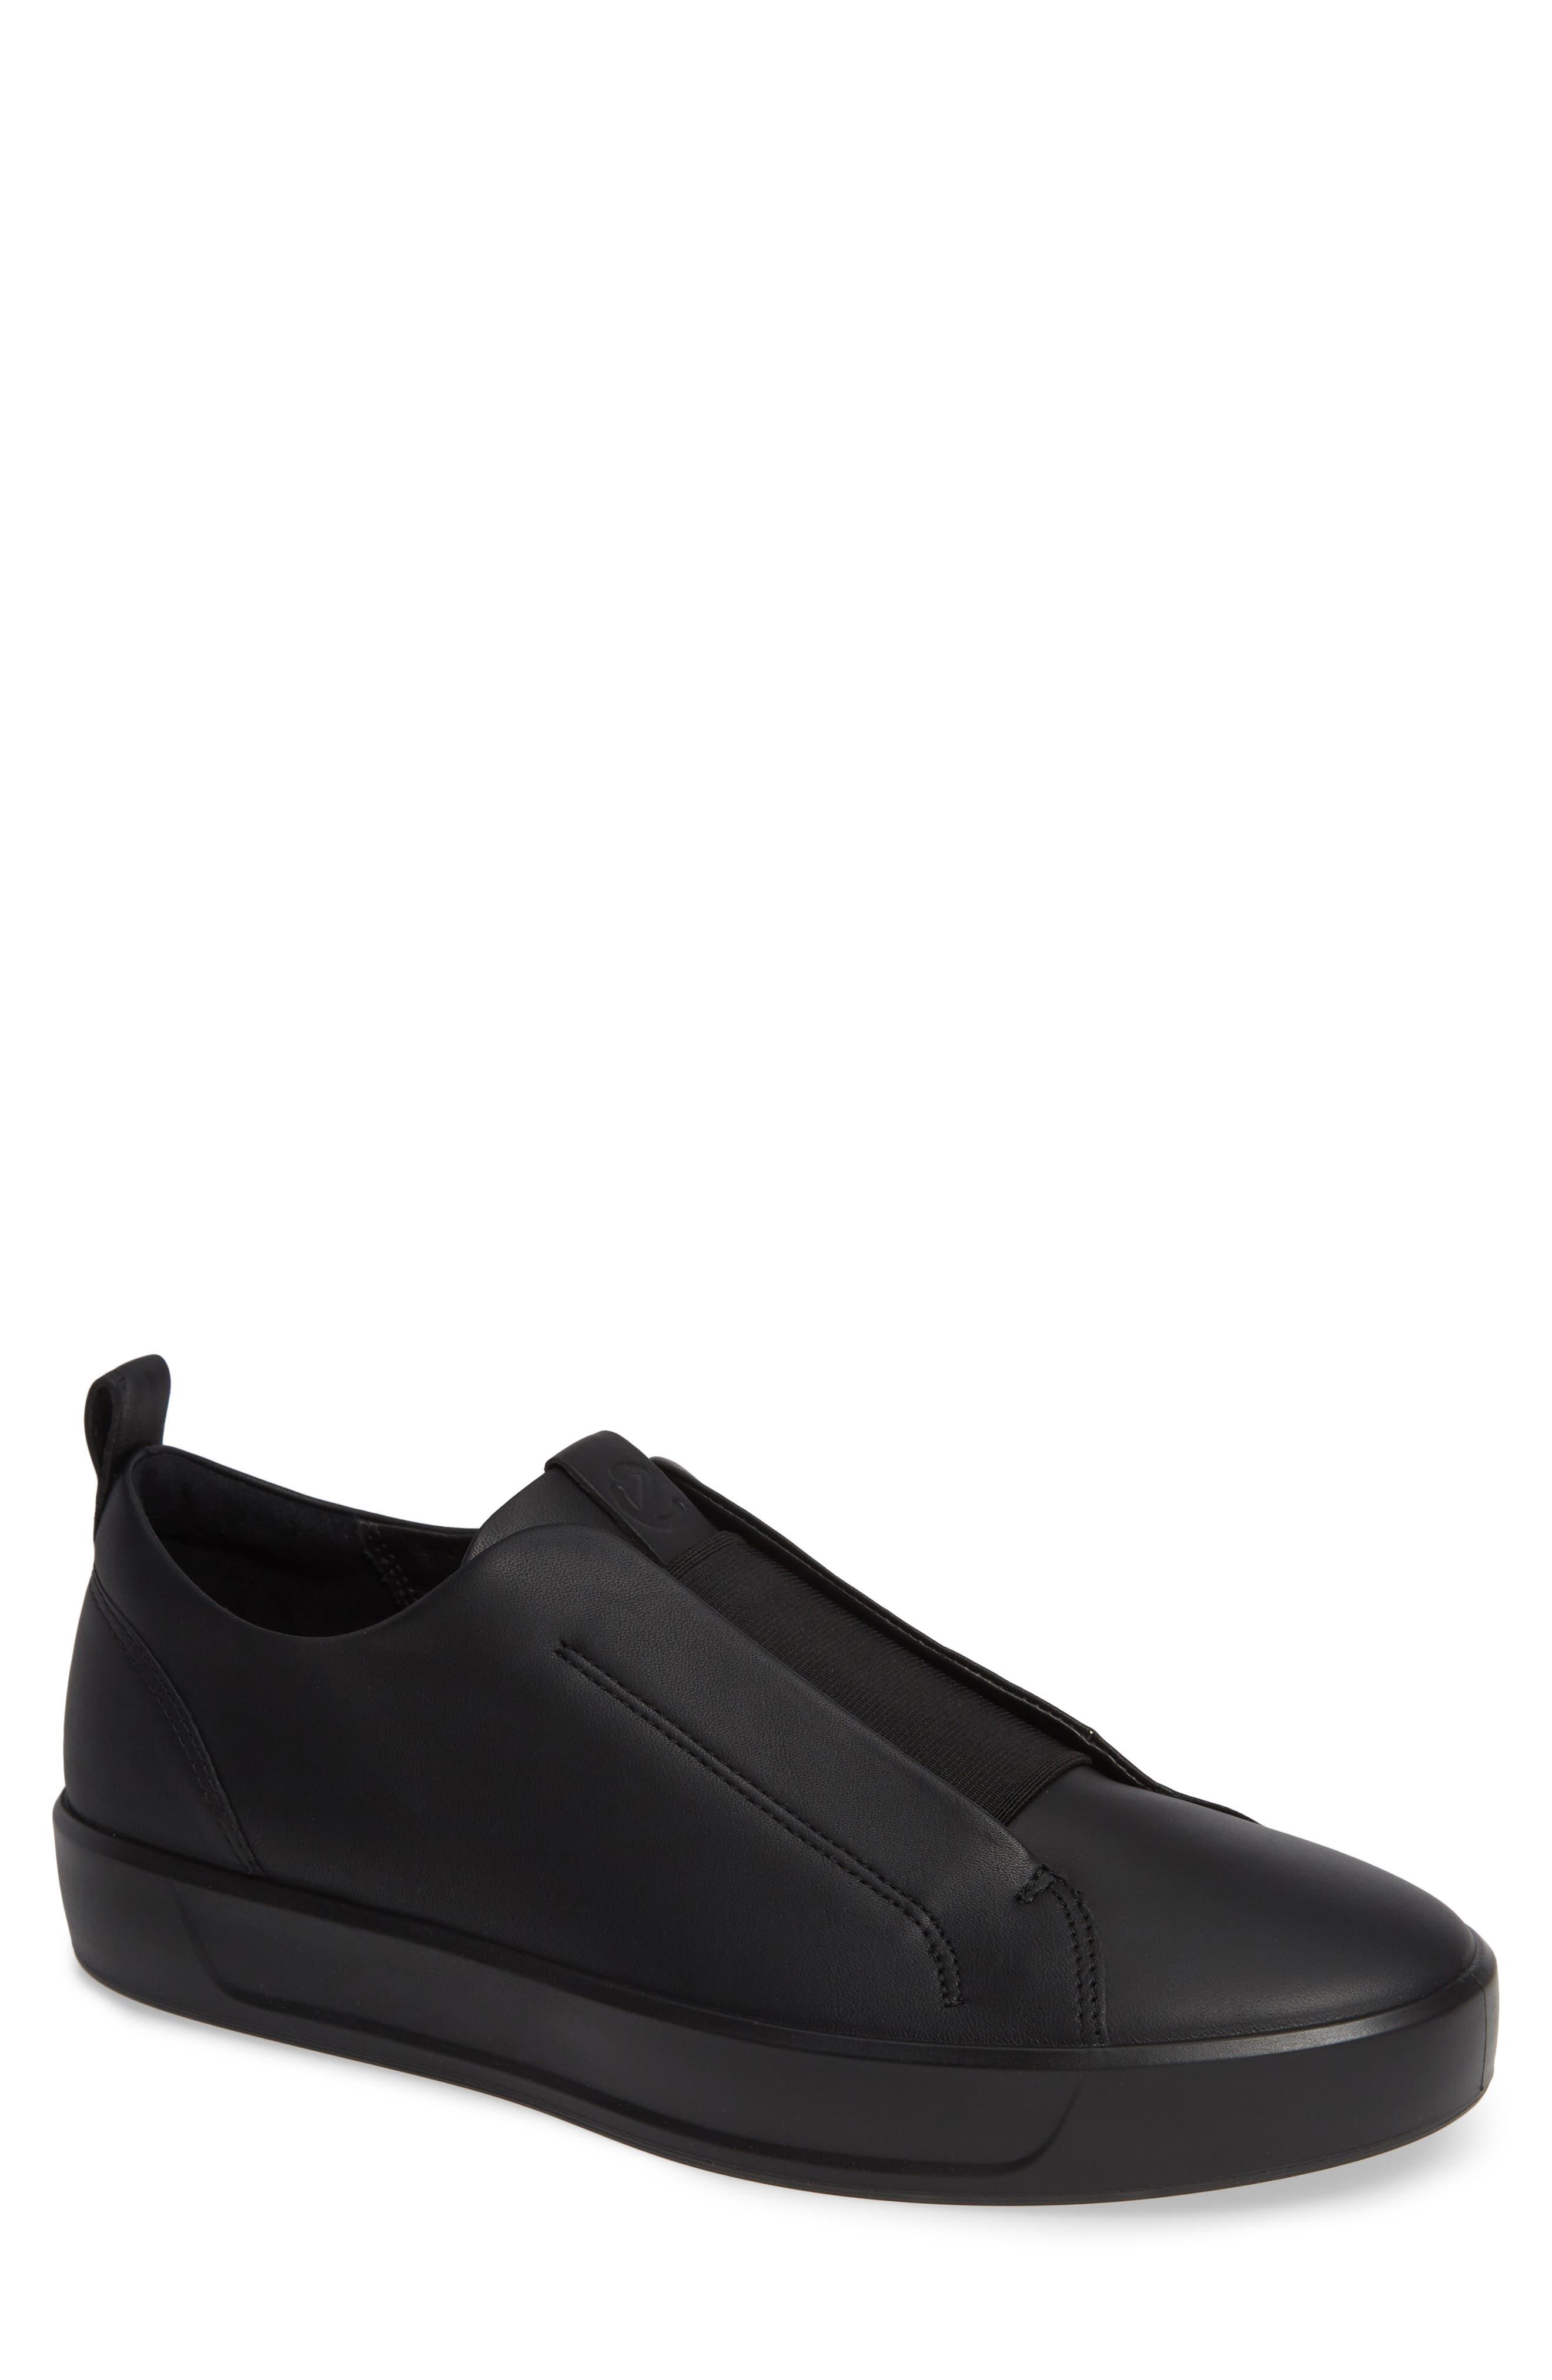 Soft 8 Slip-On Sneaker,                             Main thumbnail 1, color,                             BLACK/ BLACK LEATHER